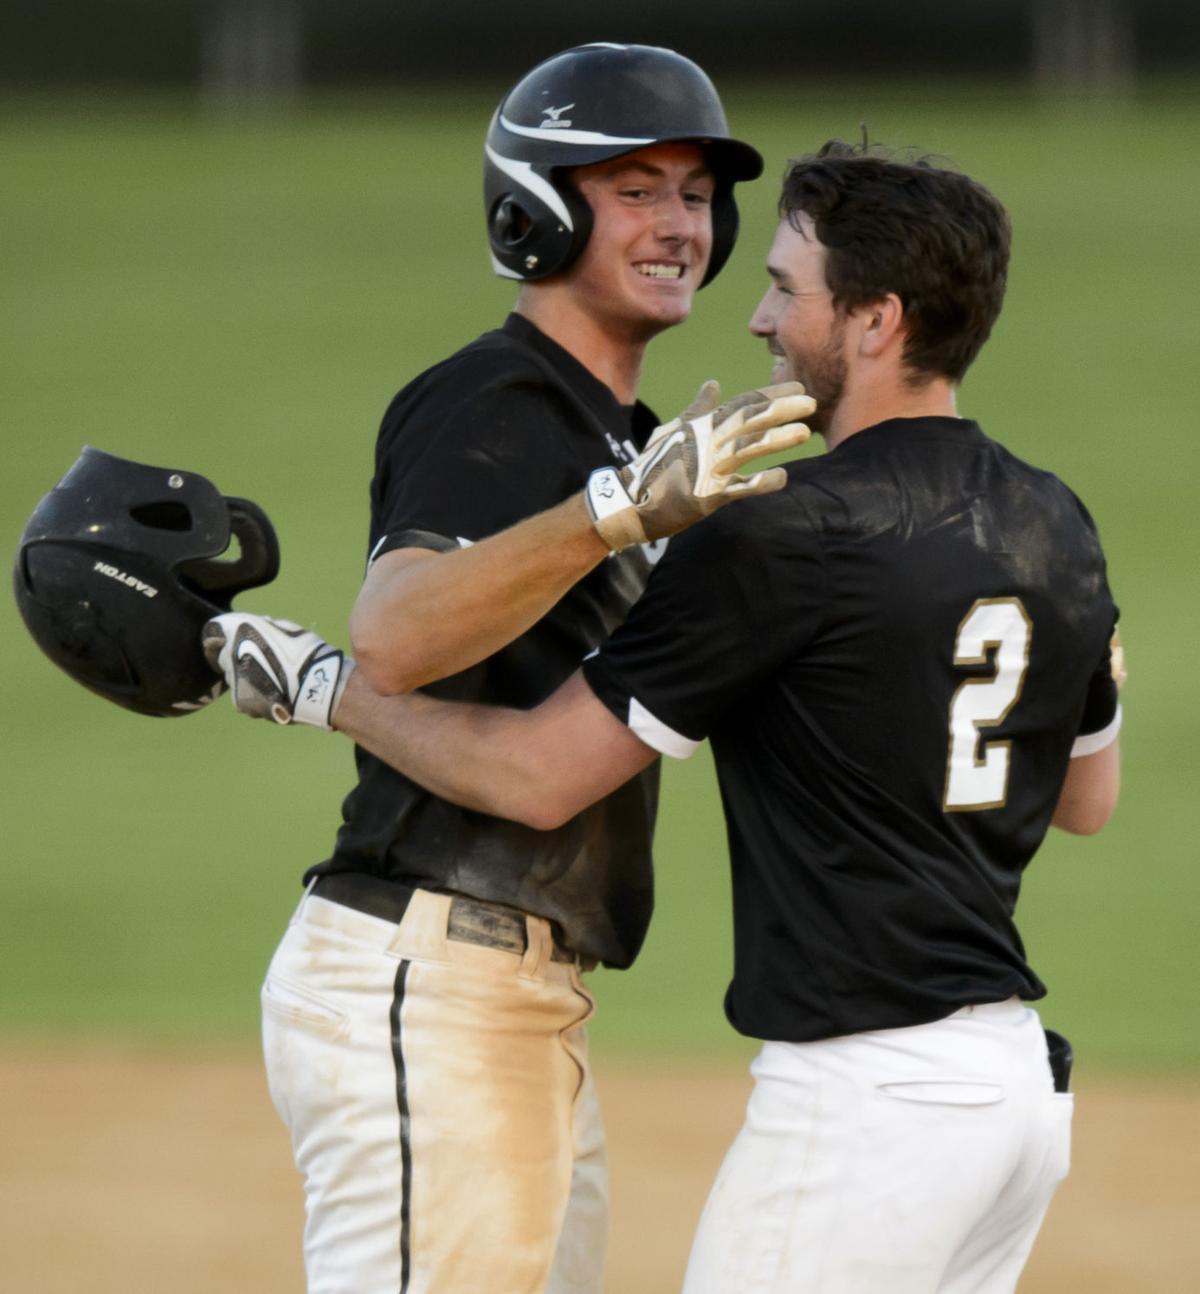 We Buy Houses Lincoln Ne: All-state Baseball: Honorable Mention